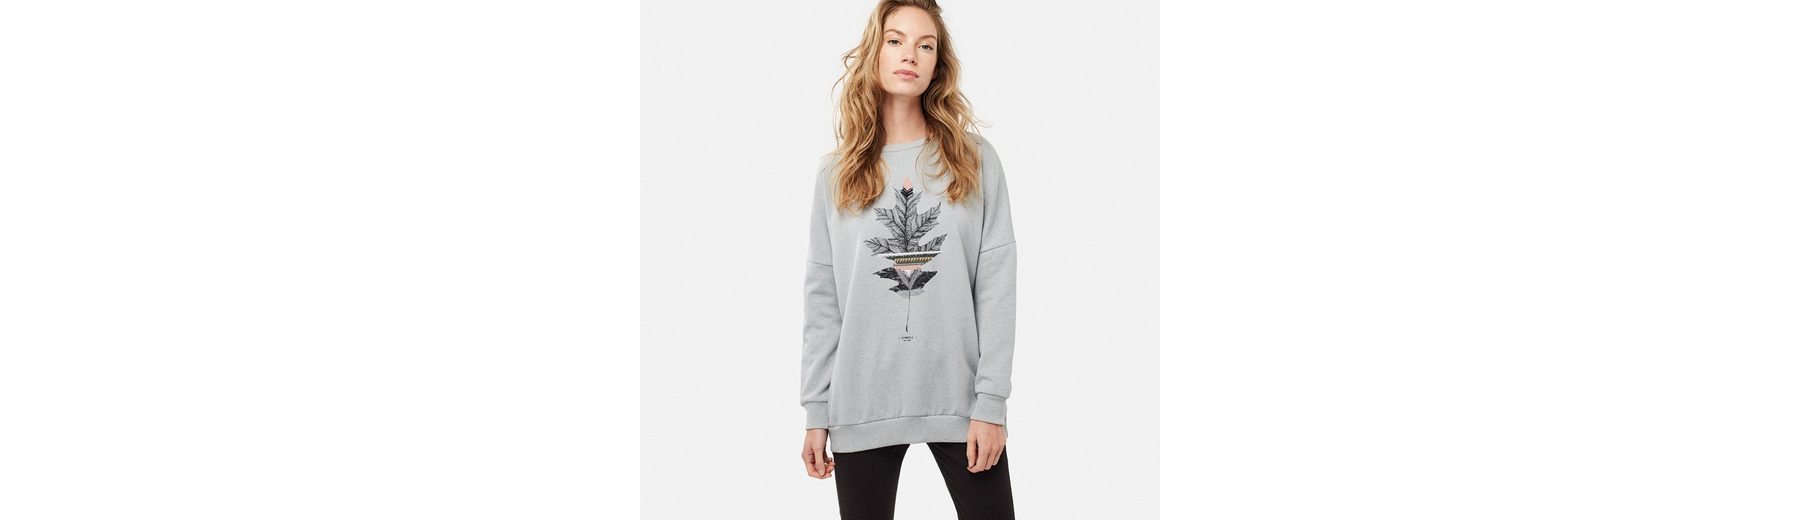 O'Neill Pines Sweatshirt Sweatshirt Peaceful O'Neill Peaceful Pines O'Neill 0a0rHC